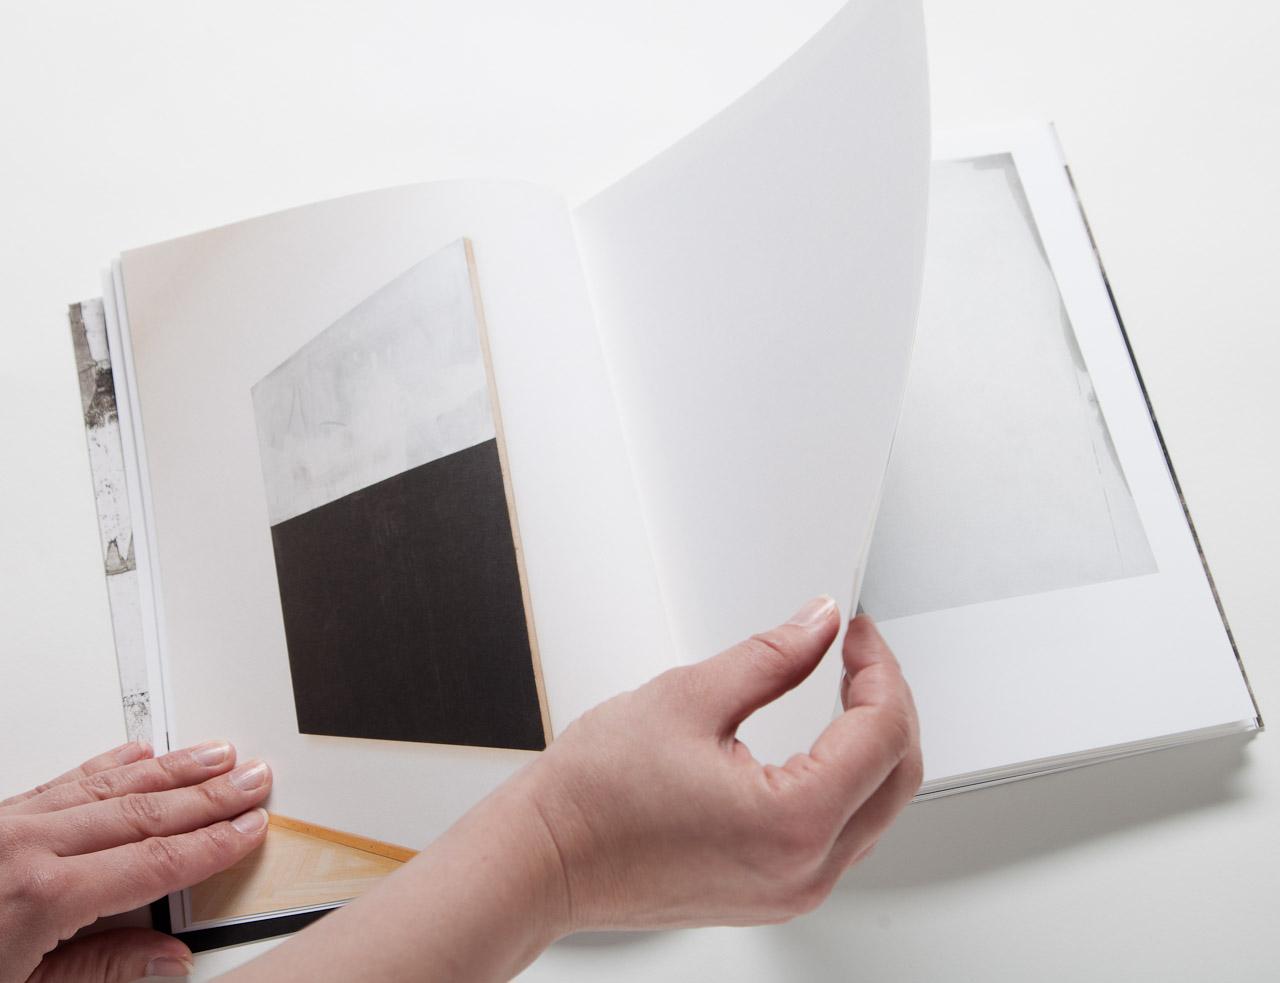 Erwin_Bohatsch_Katalog-8857